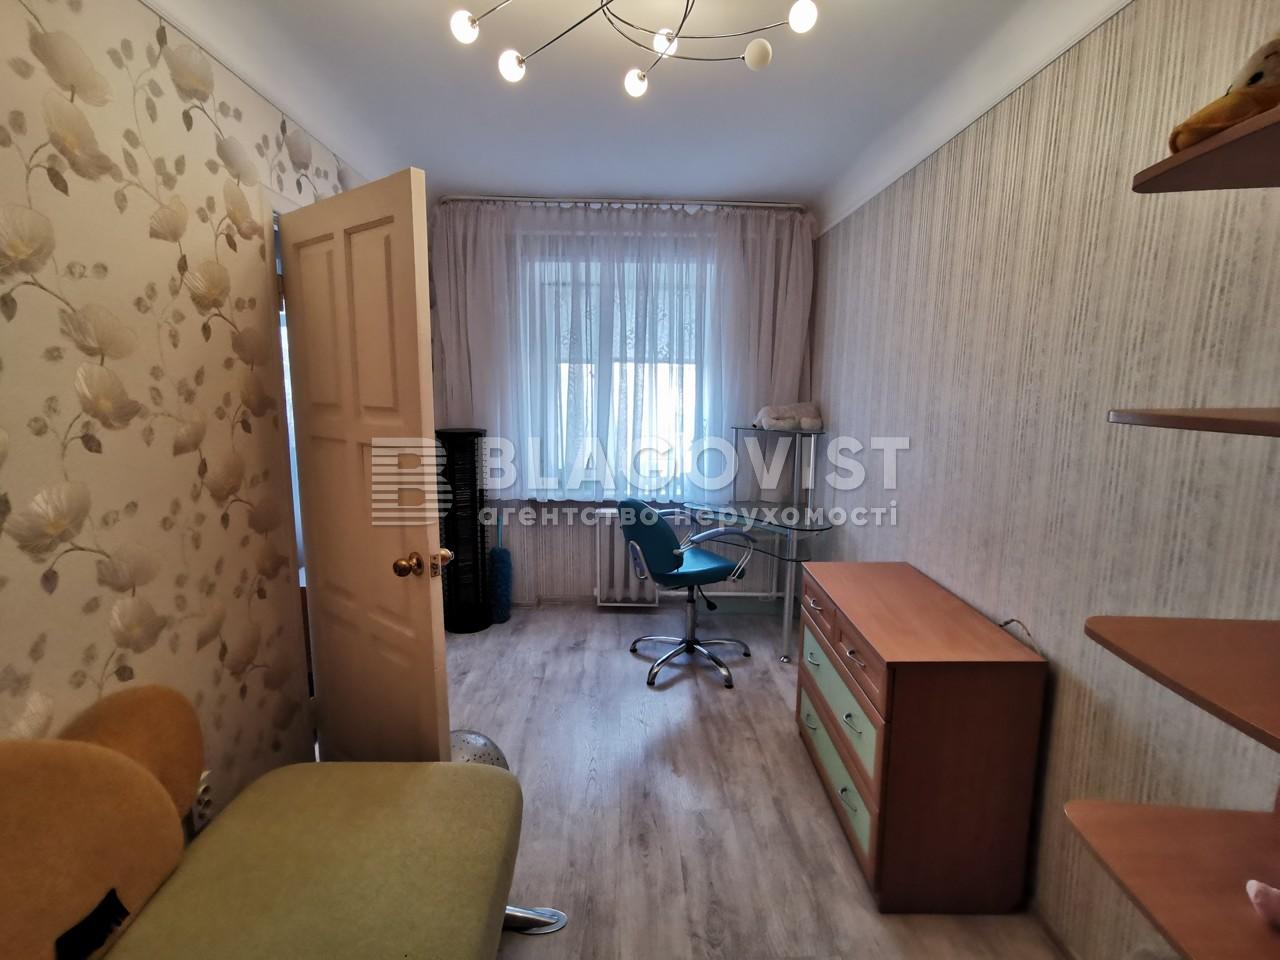 Квартира R-40023, Харьковское шоссе, 3, Киев - Фото 6